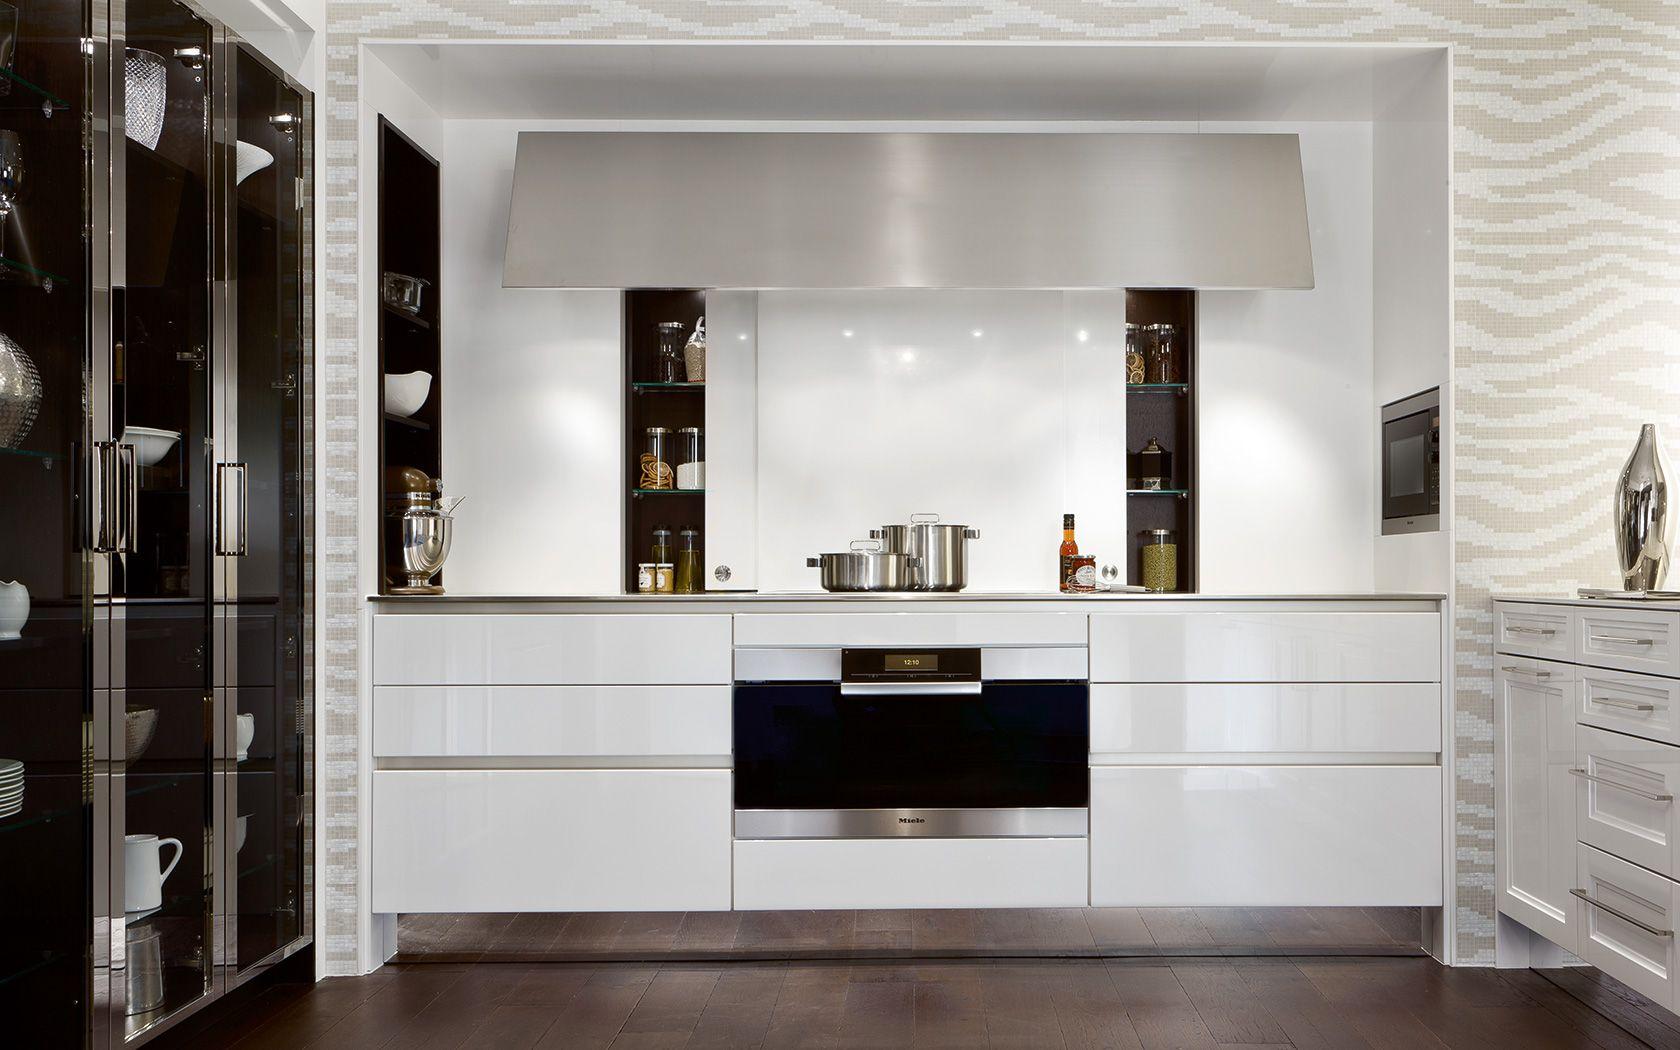 Raumkonzept Küche: BeauxArts.02 | SieMatic.de · Traditionelle KüchenModerne  KüchenModerne KüchenKüchen ModernIdeen ...